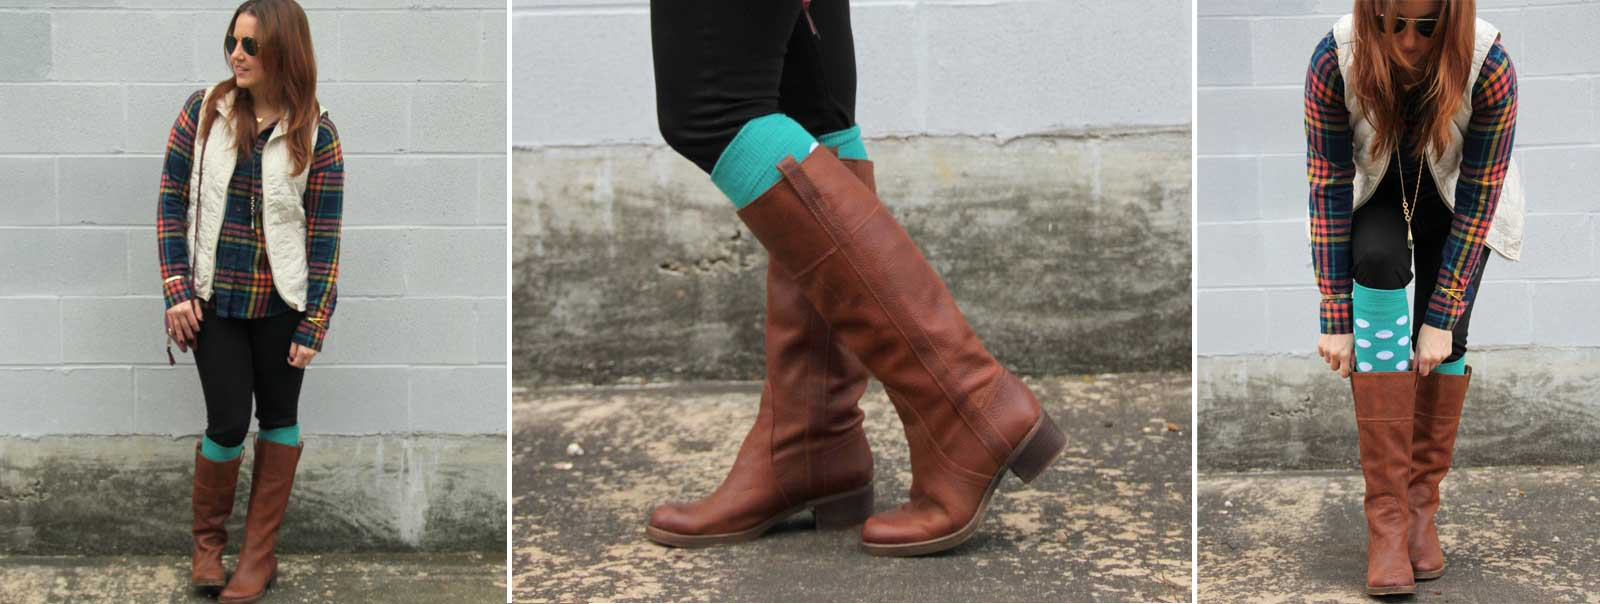 teal socks (Made in USA)